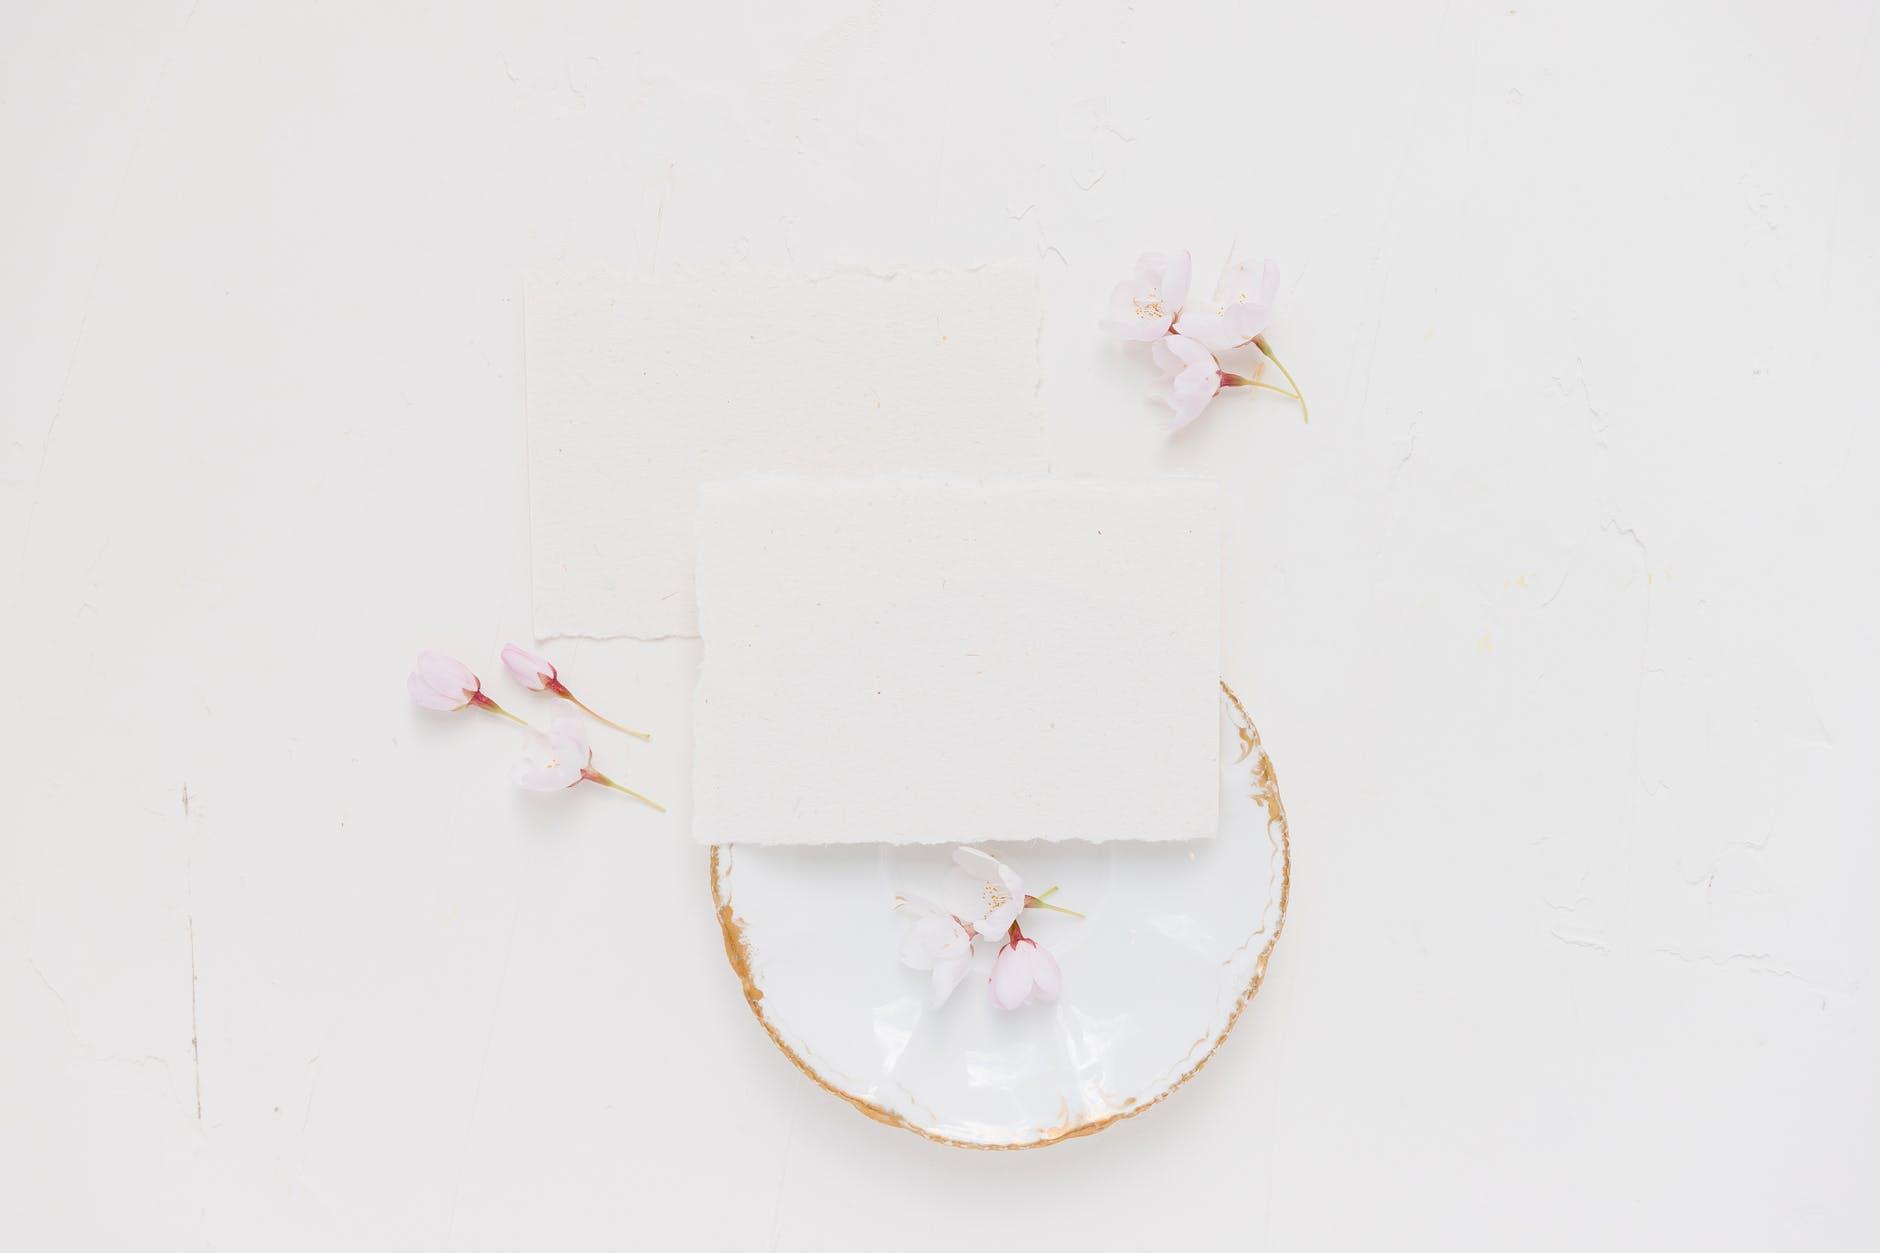 white paper on white floral textile